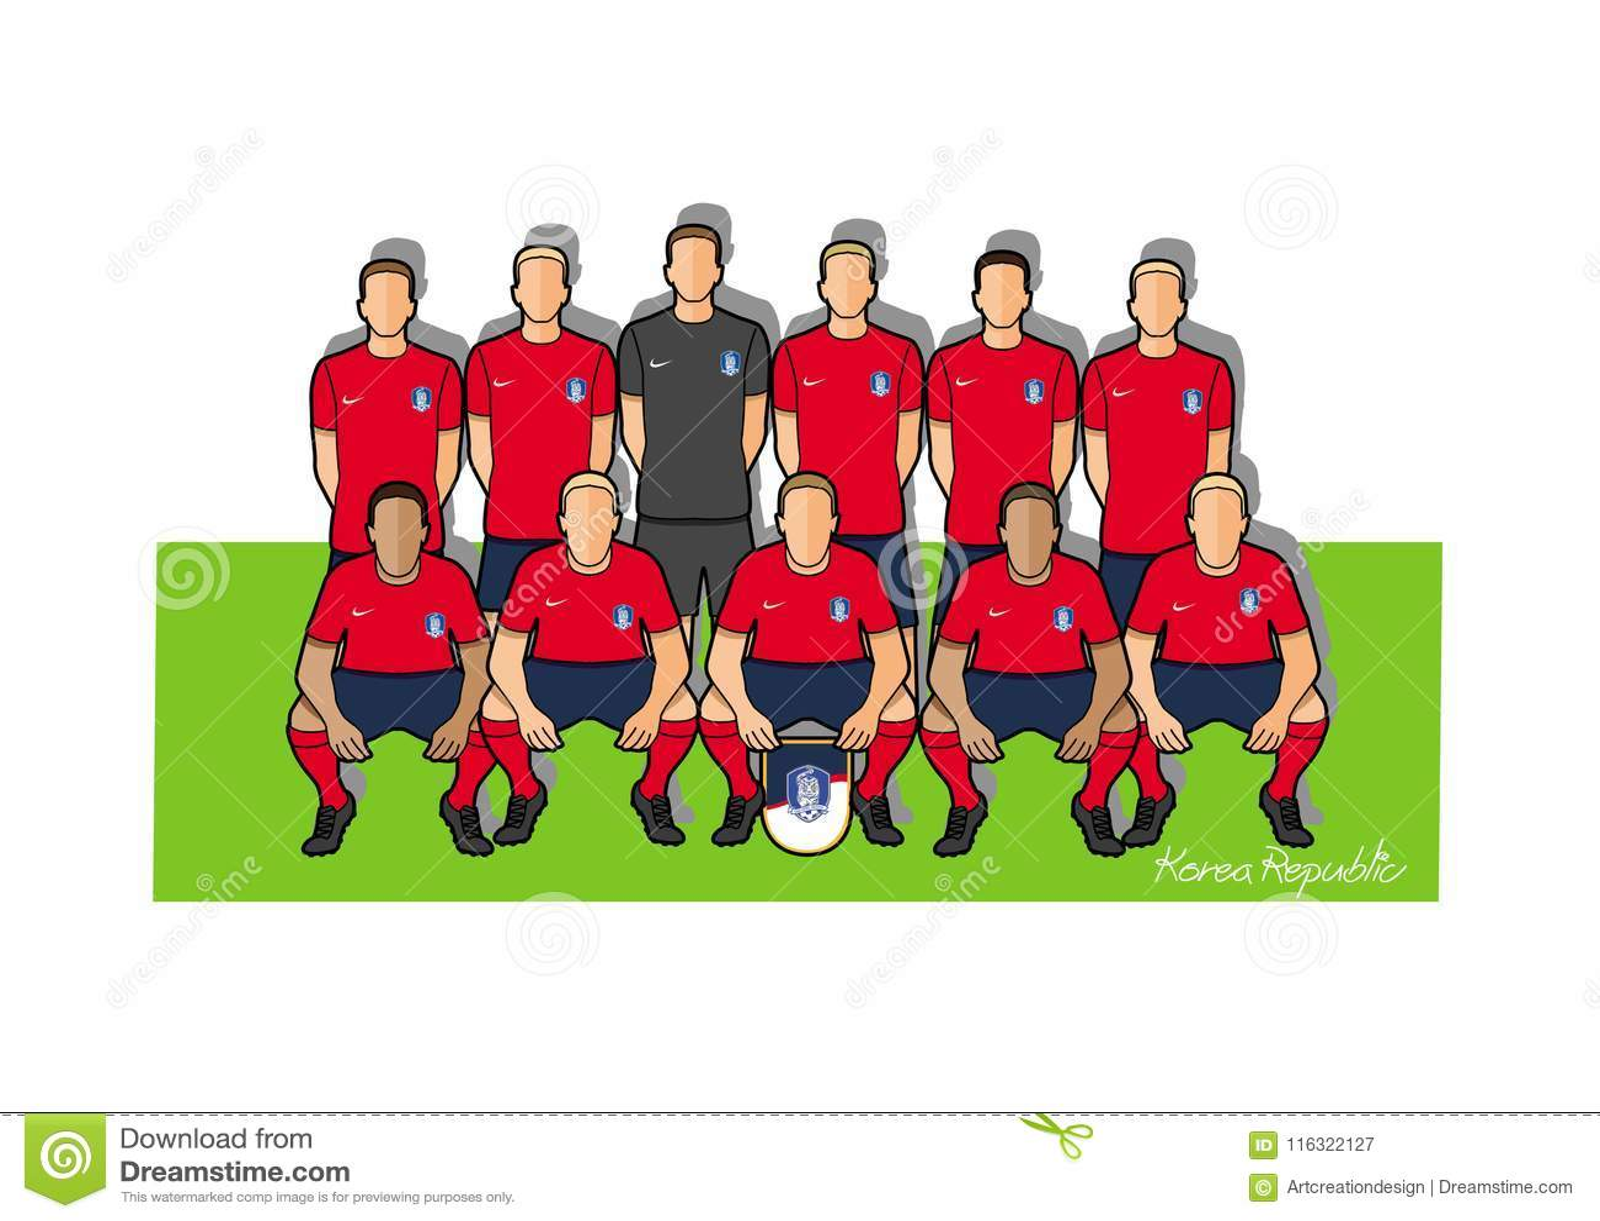 4eca2a8f8 South Korea Football Team 2018 Stock Vector - Illustration of 2018 ...